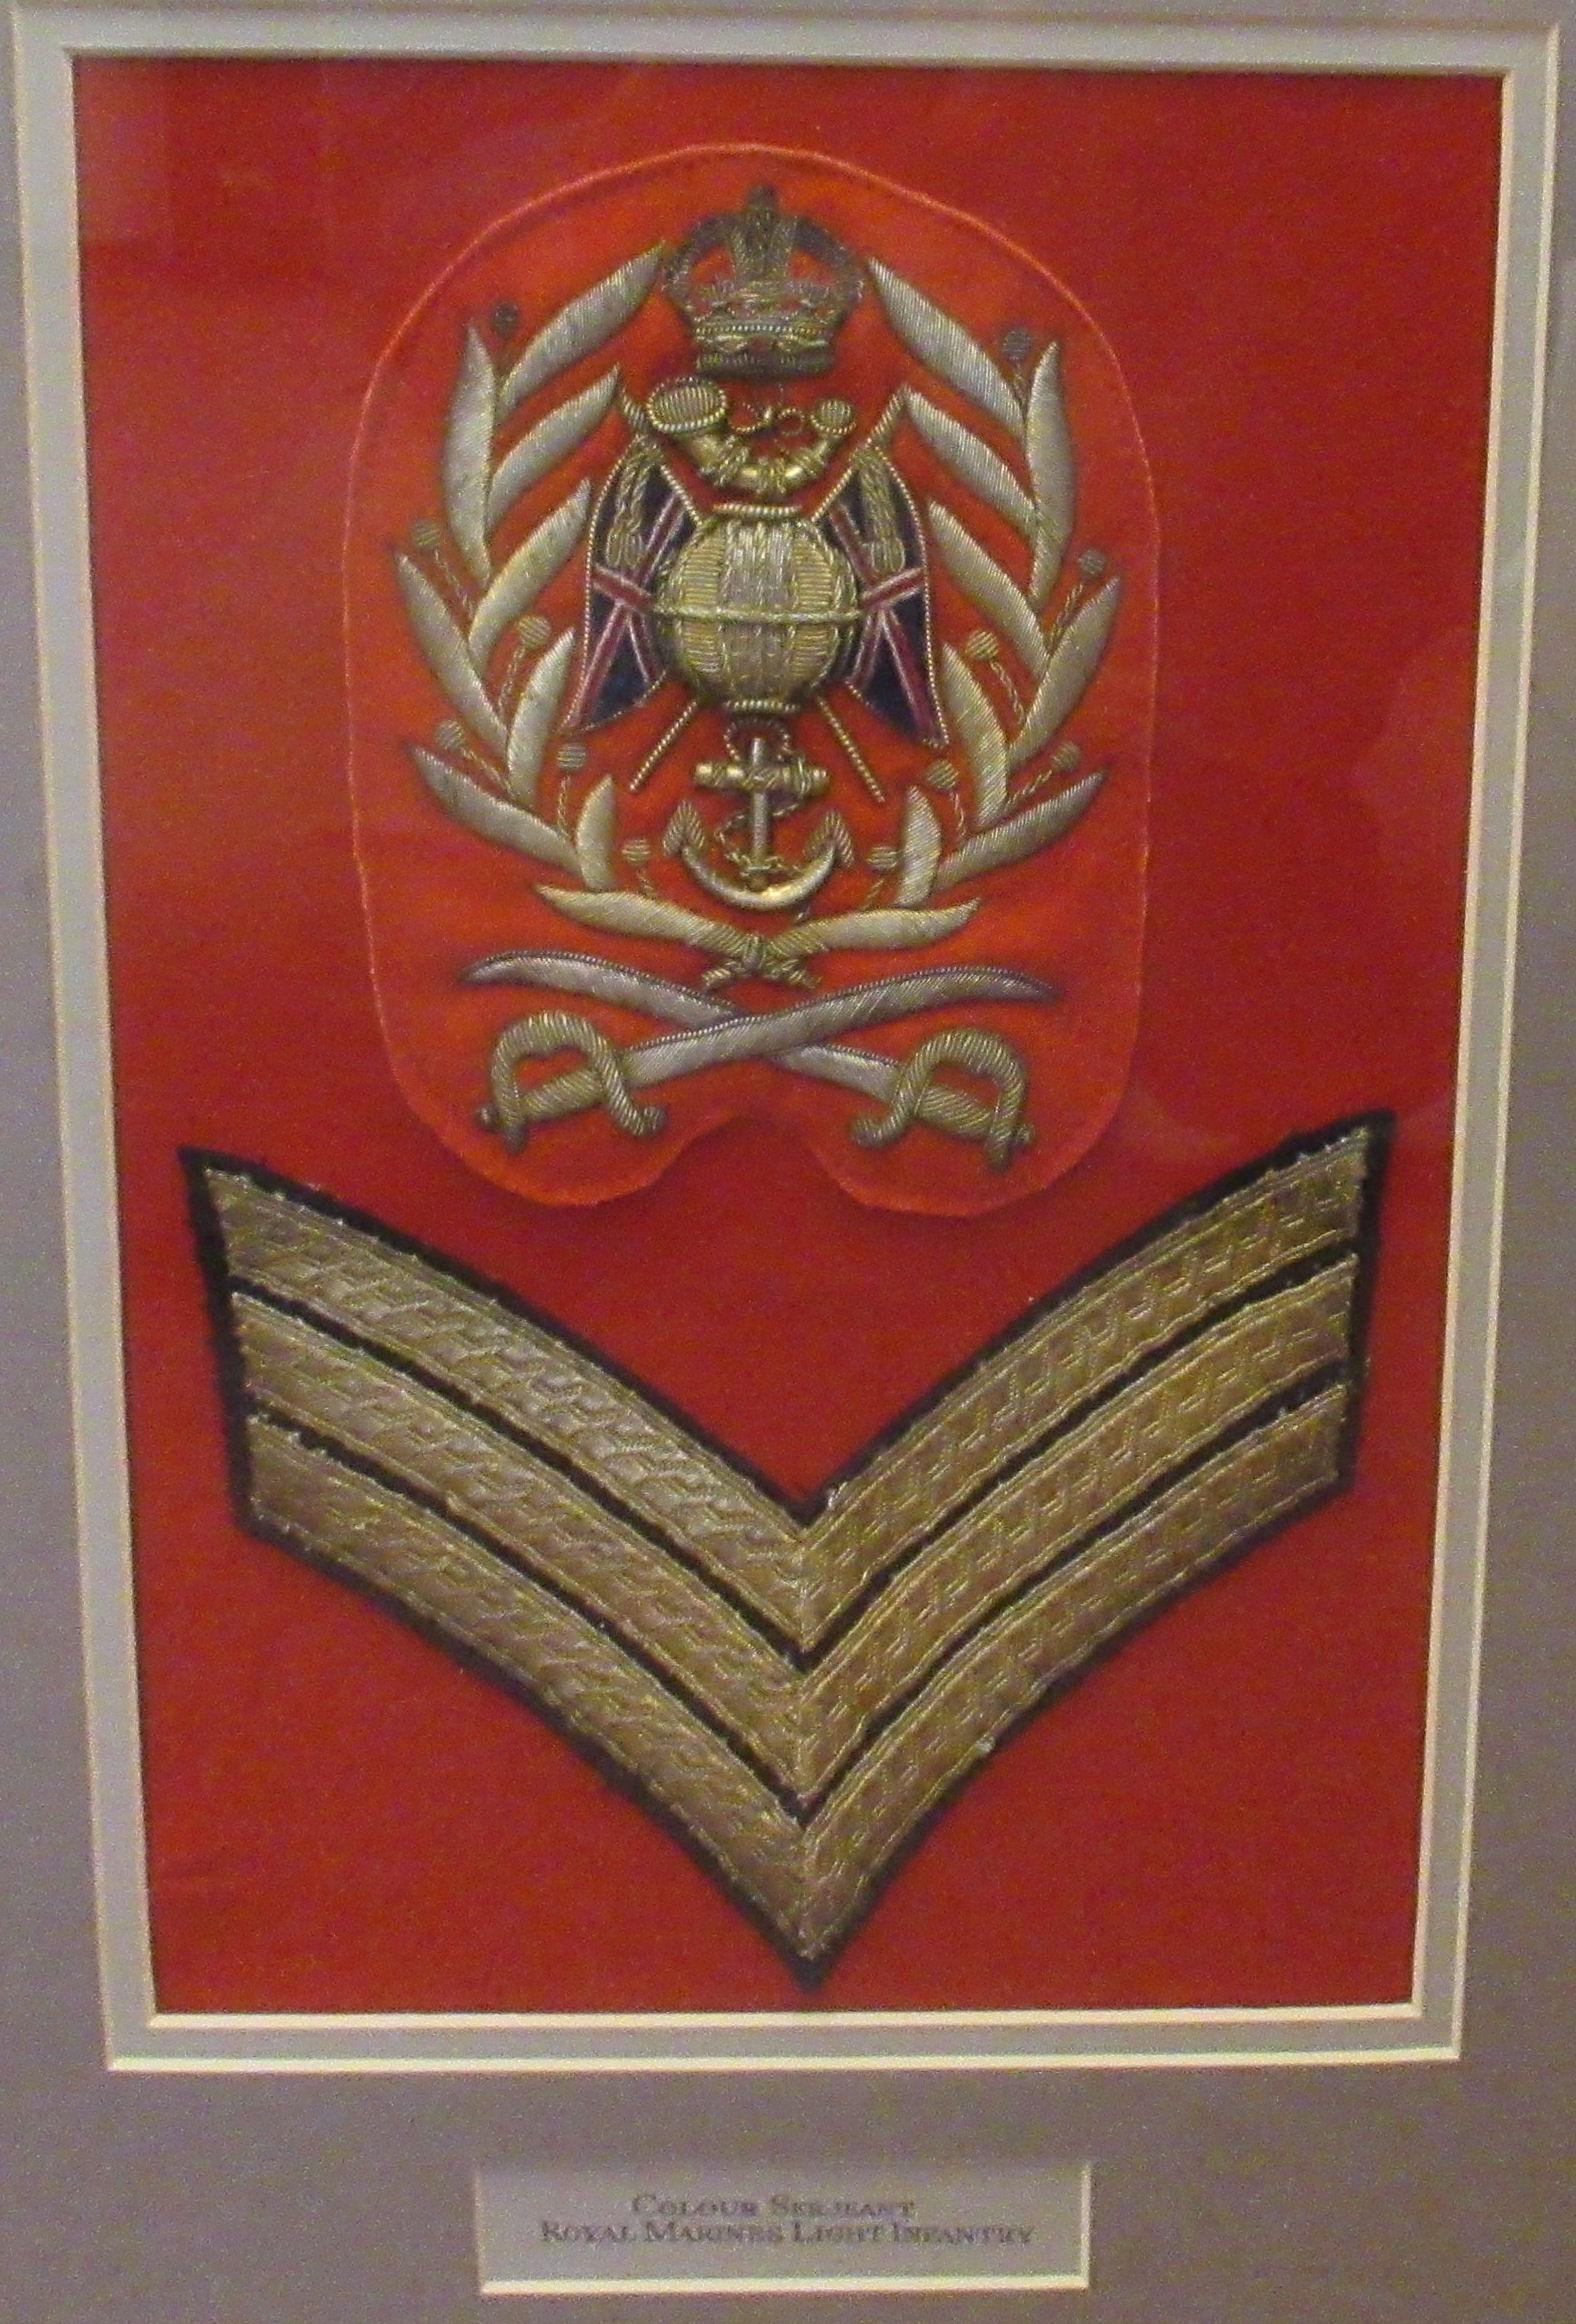 British military braided uniform insignia, viz. Colour Sergeant Royal Marines Light Infantry( - Image 2 of 4